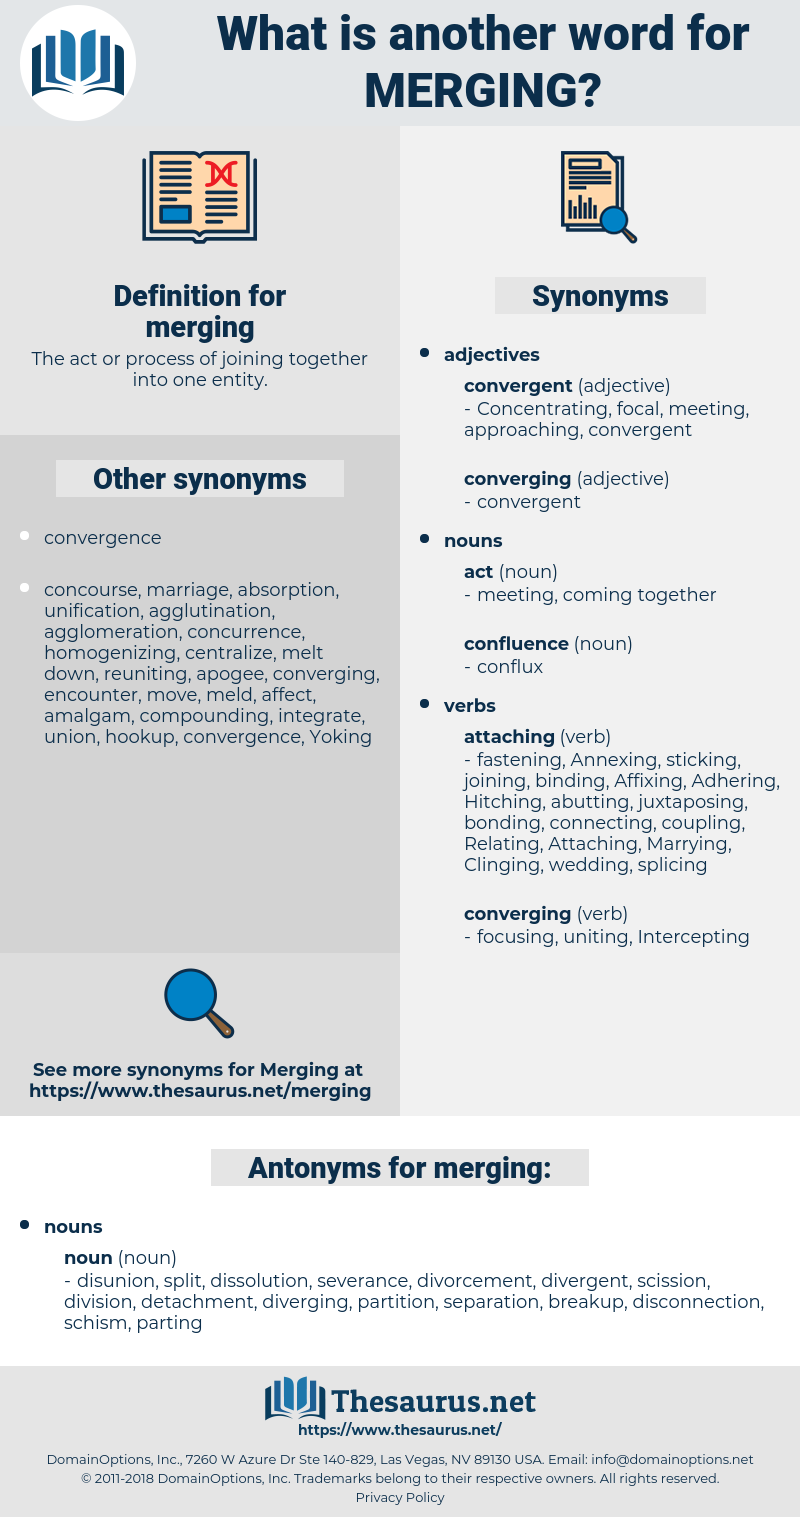 merging, synonym merging, another word for merging, words like merging, thesaurus merging